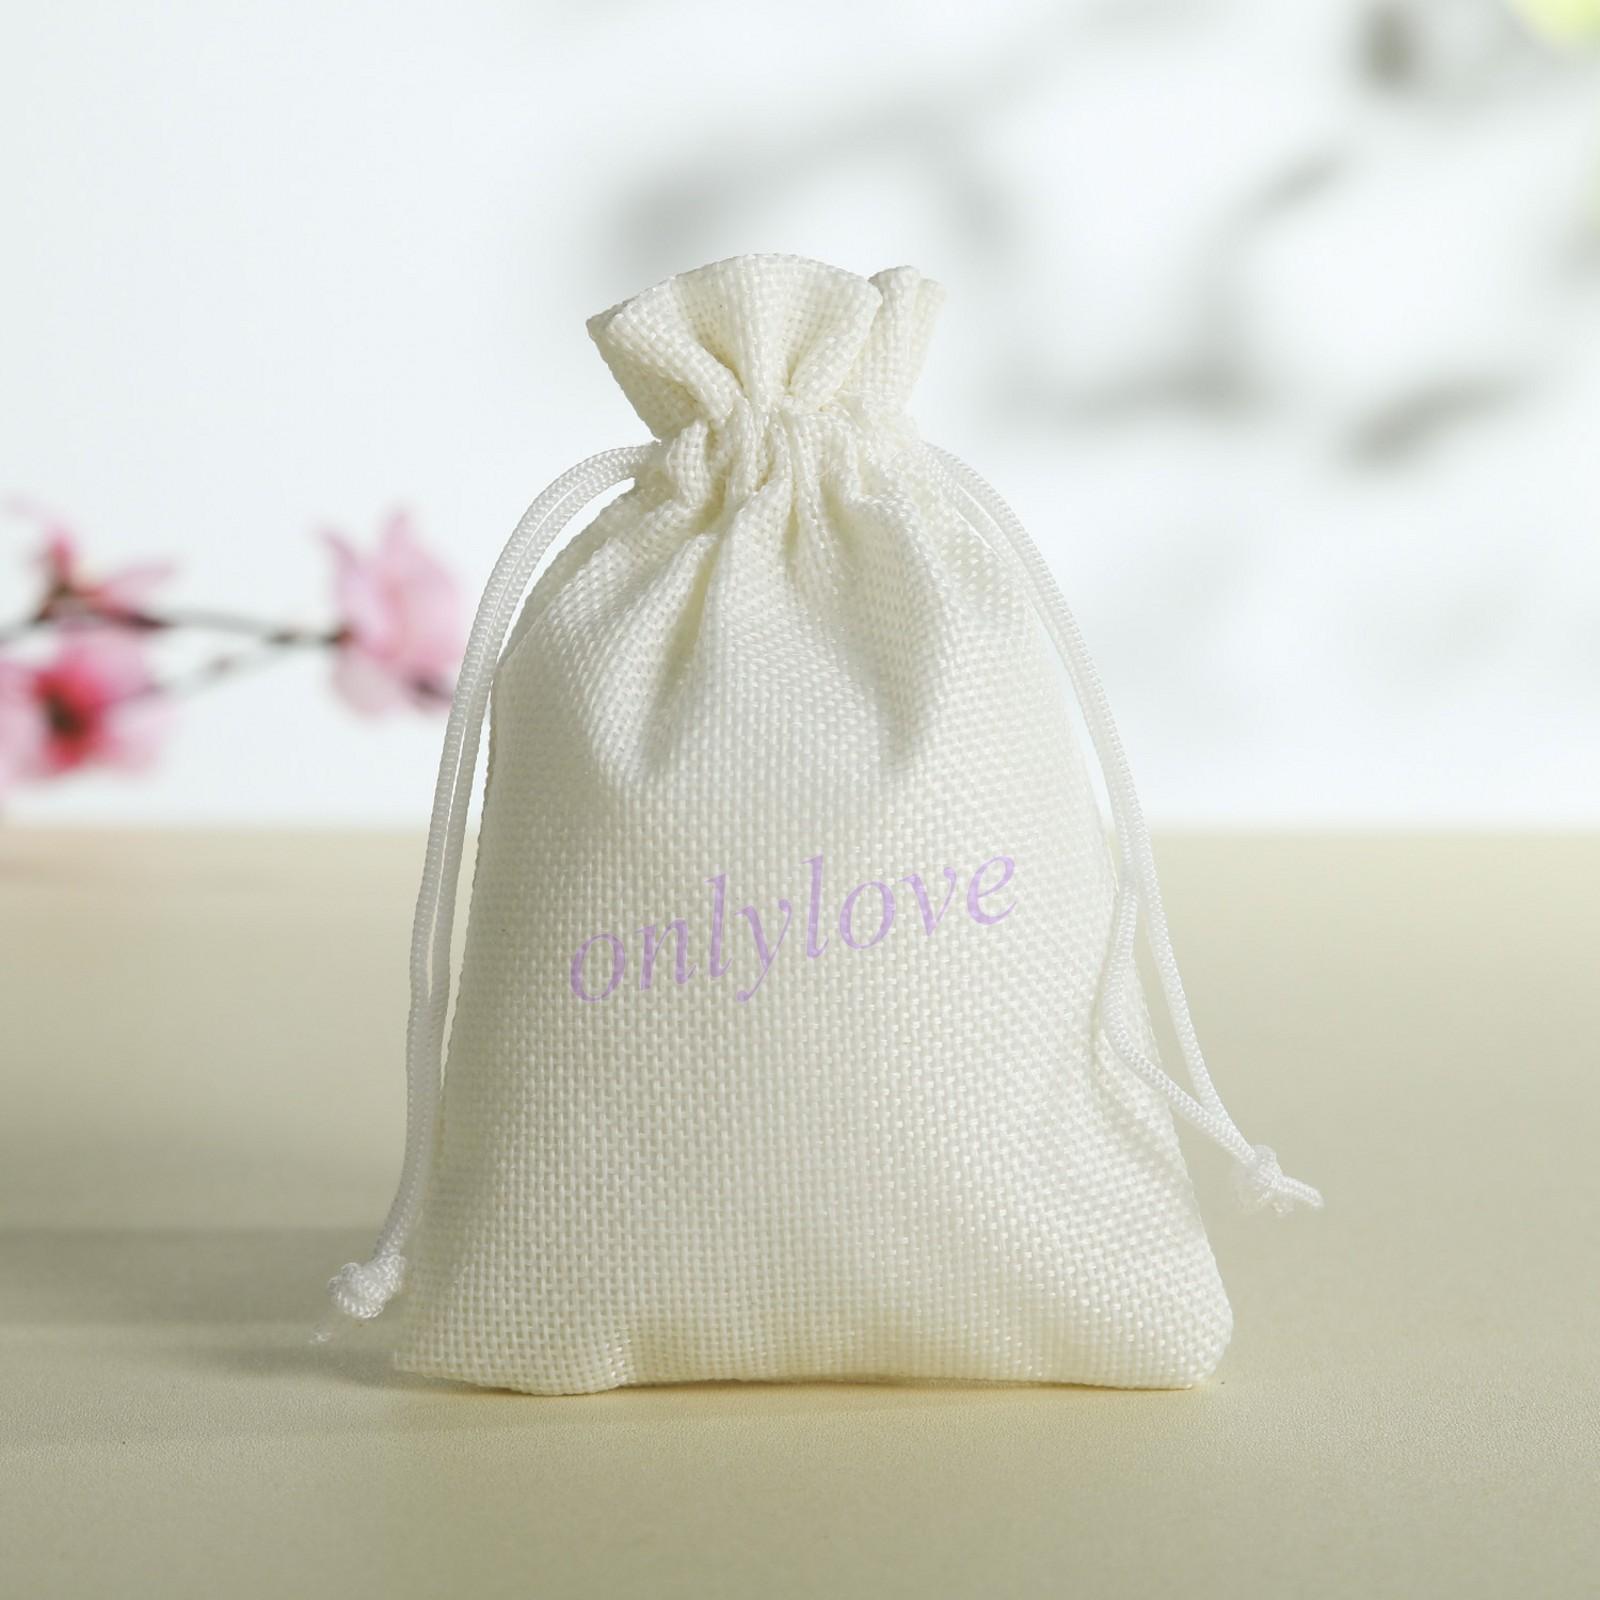 5 10 50 Wedding Favor Hessian Burlap Jute Favour Gift Bags ...